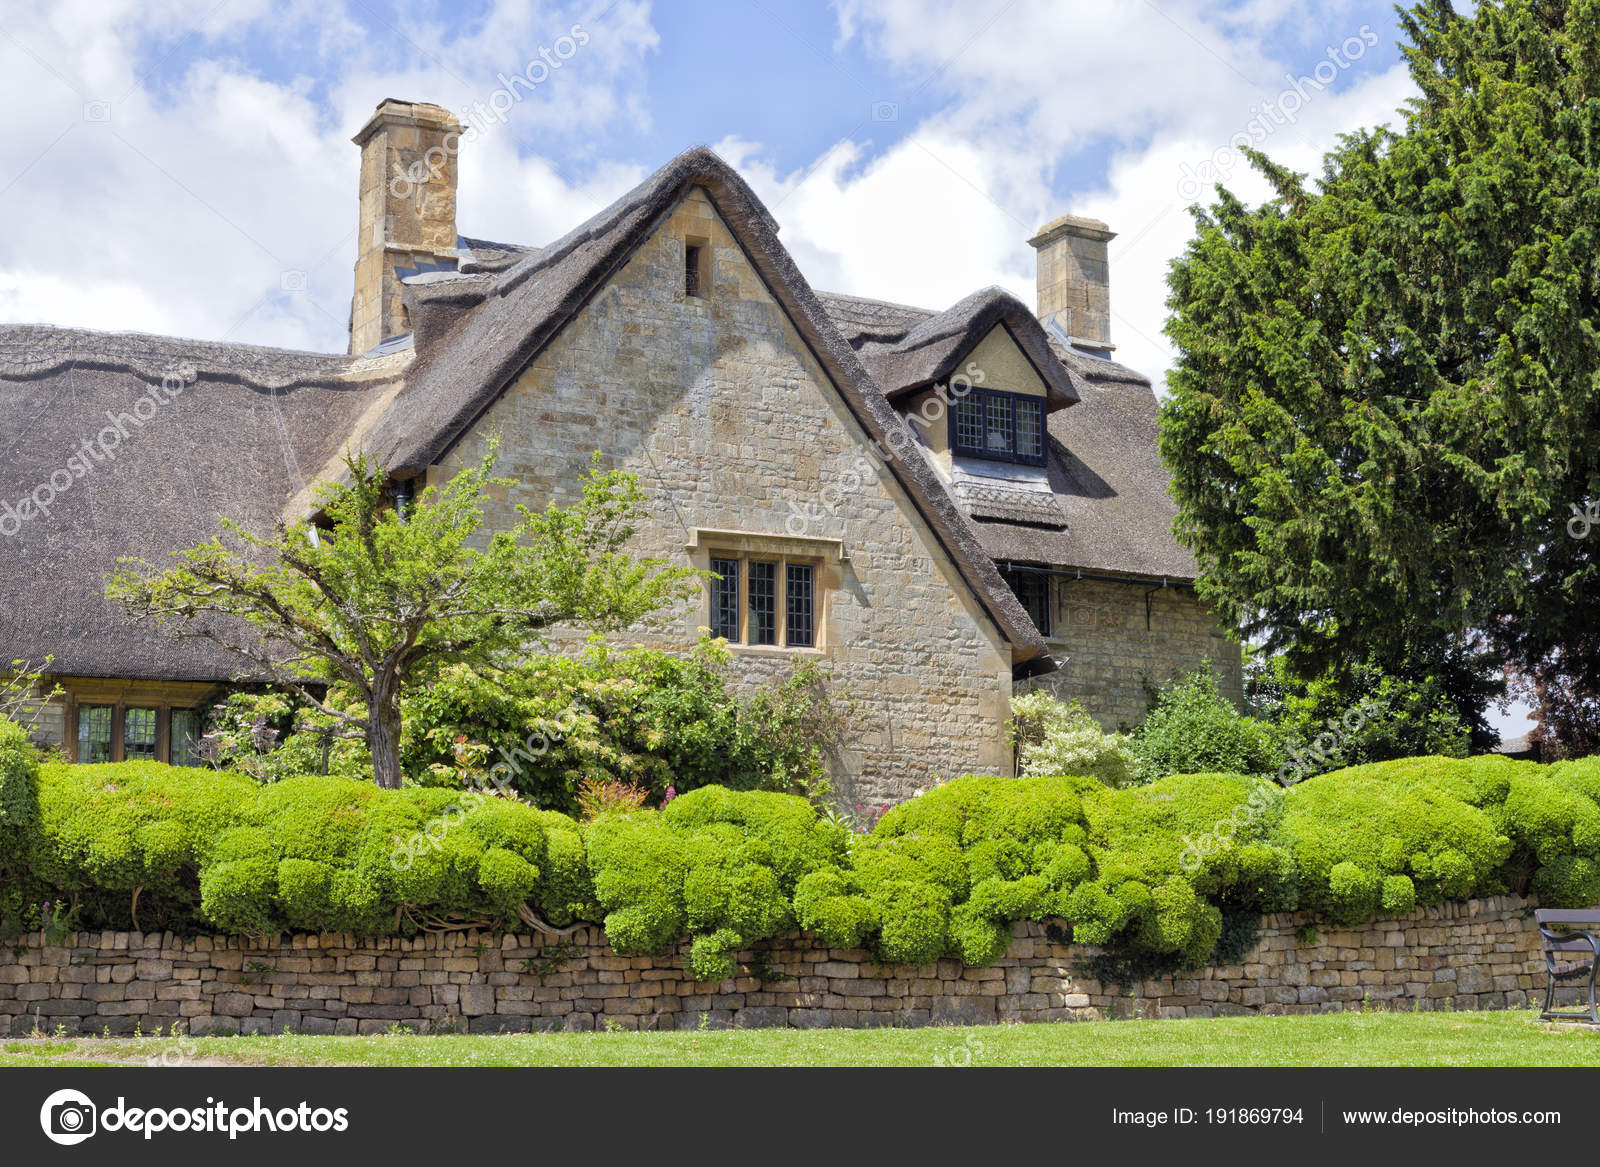 Oude rieten dak engelse cottage cotswold platteland met stenen